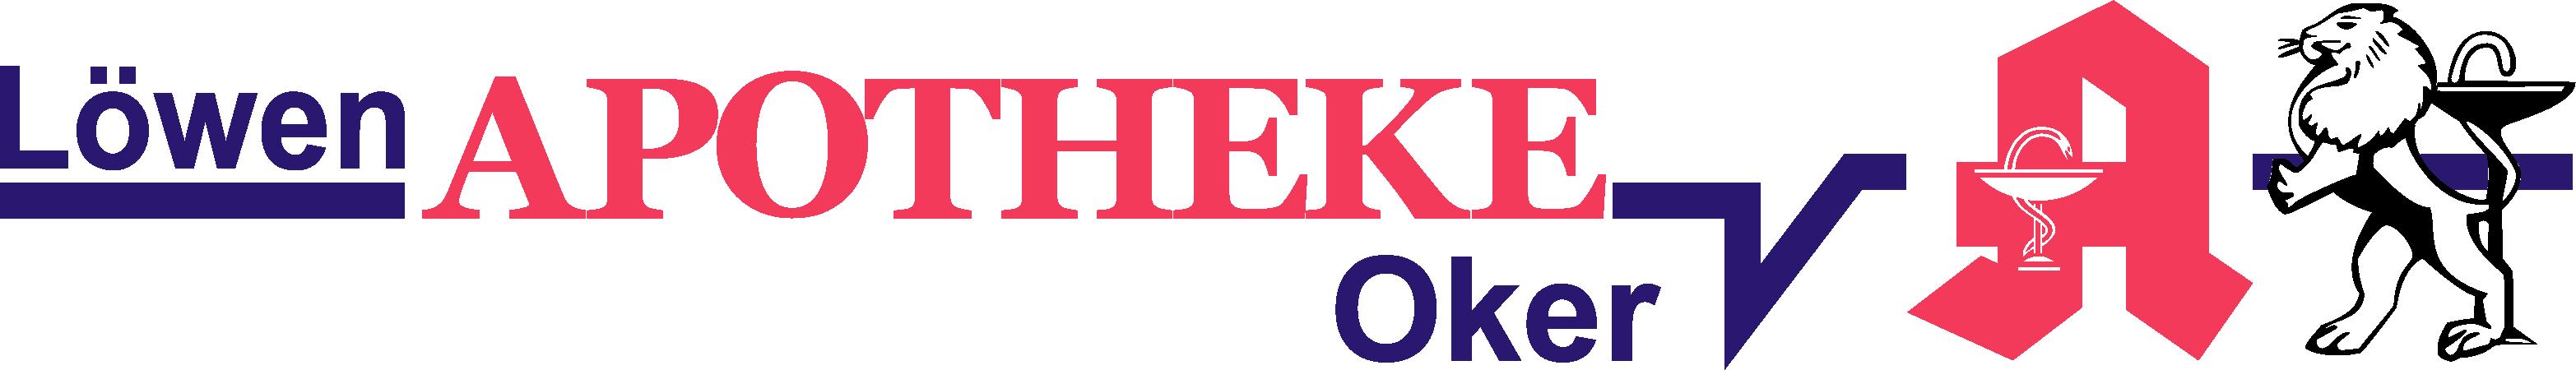 Logo der Löwen Apotheke Oker